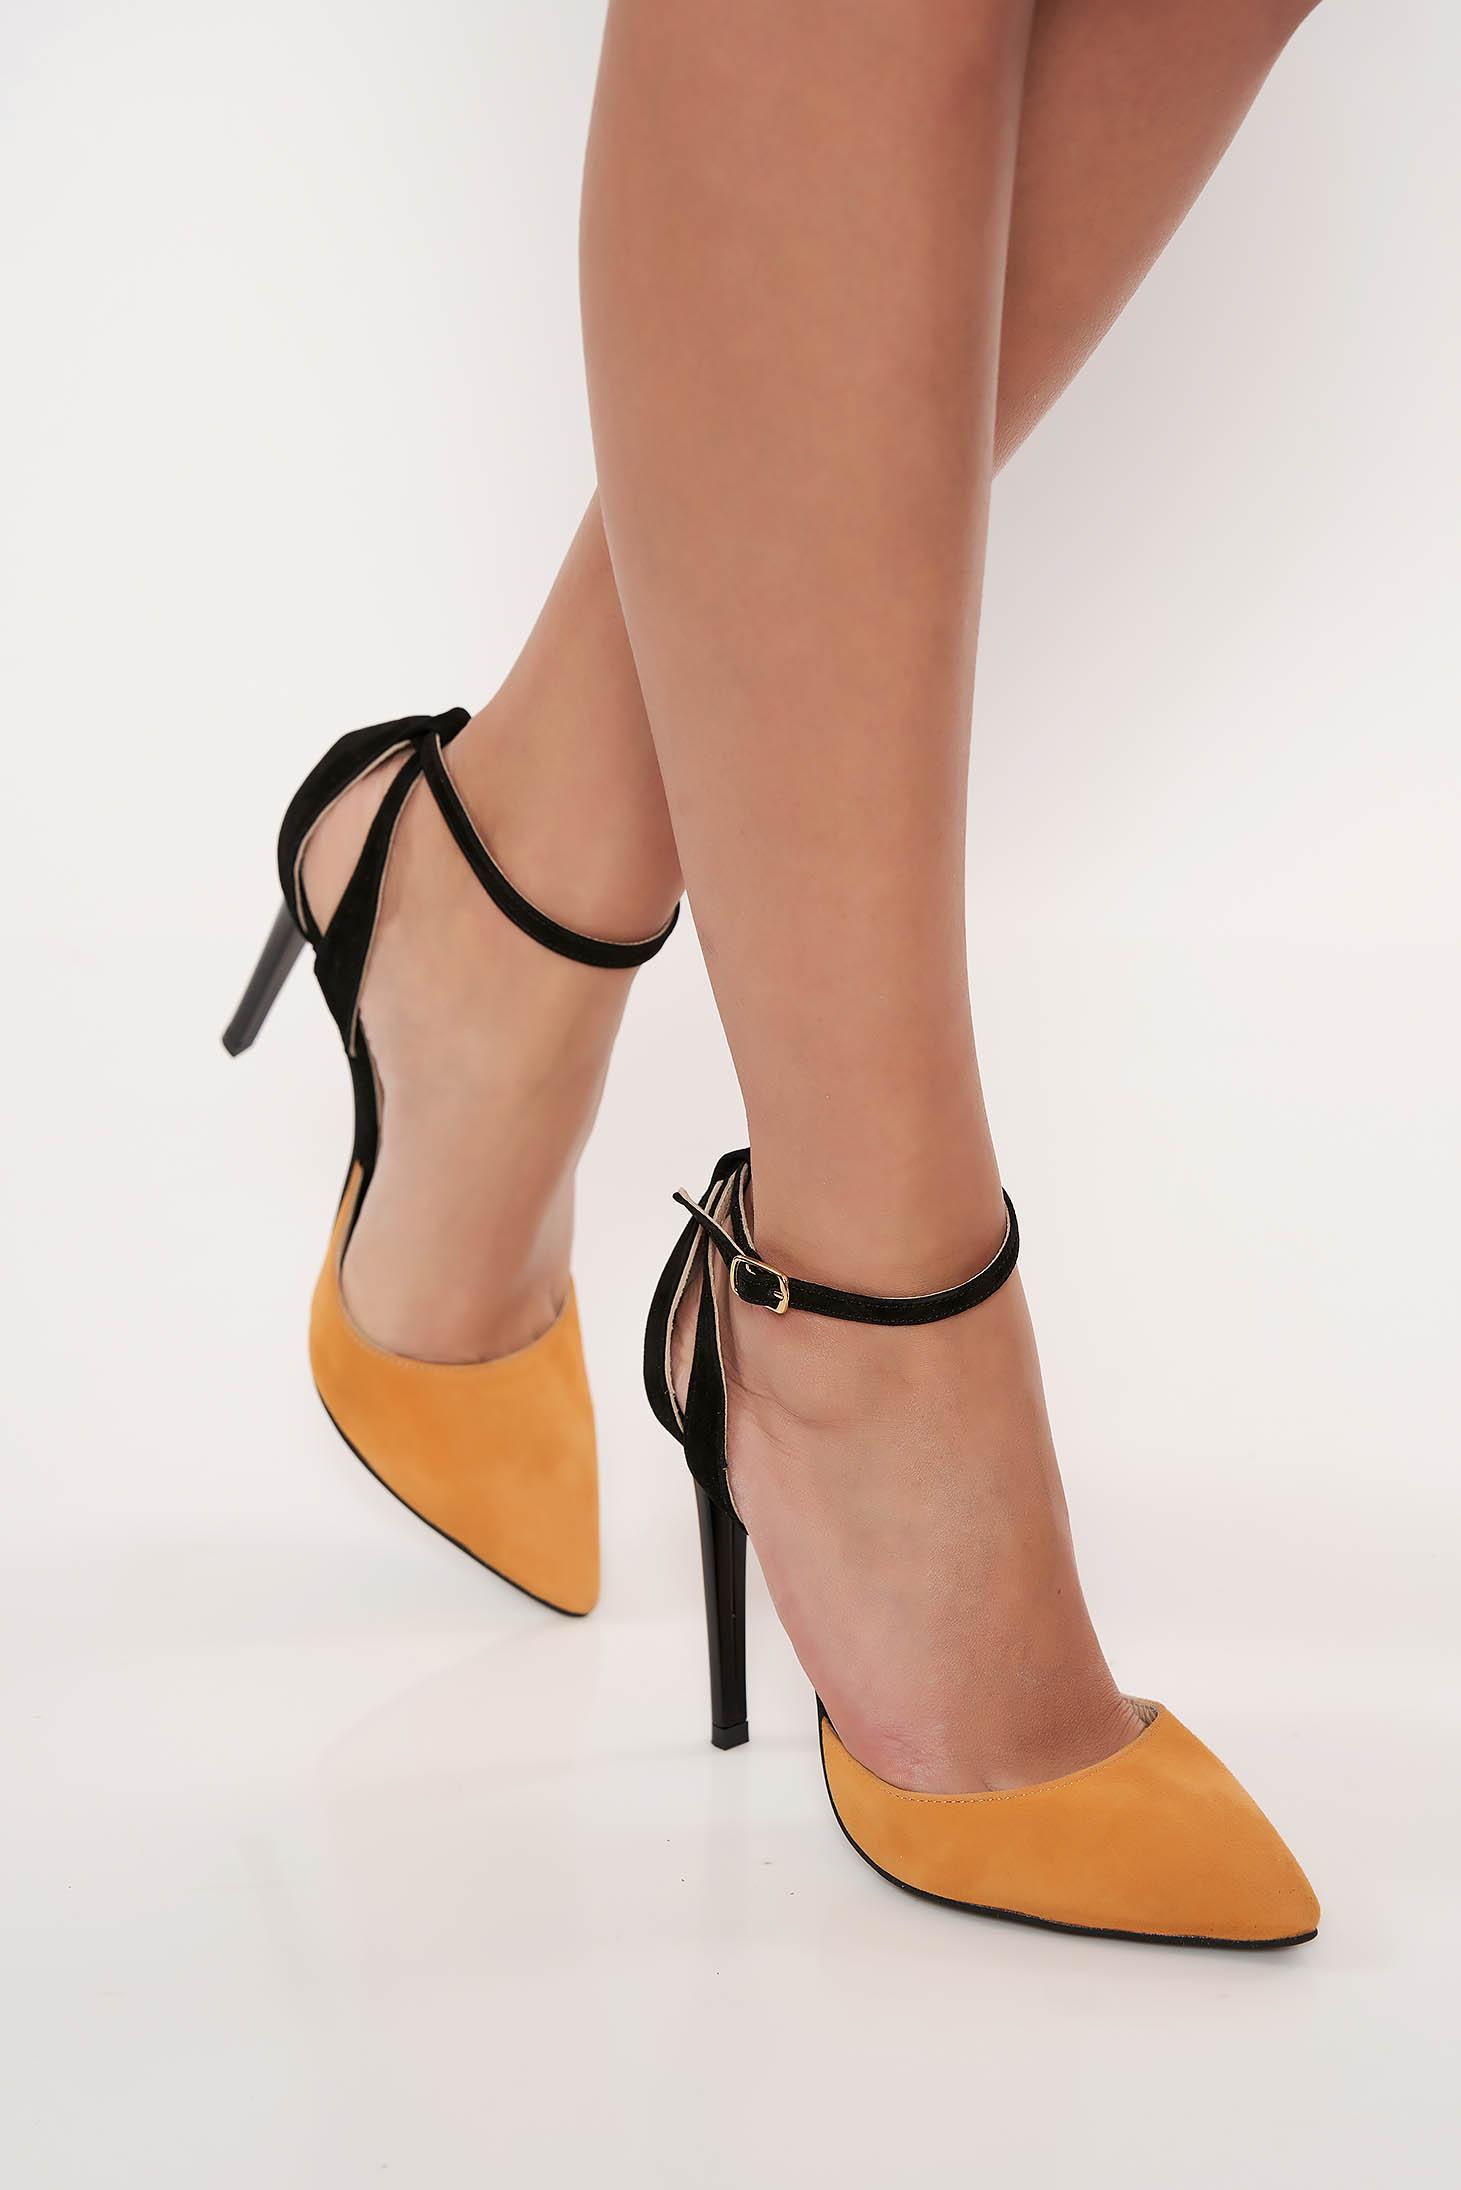 Pantofi stiletto galbeni eleganti din piele naturala cu toc inalt